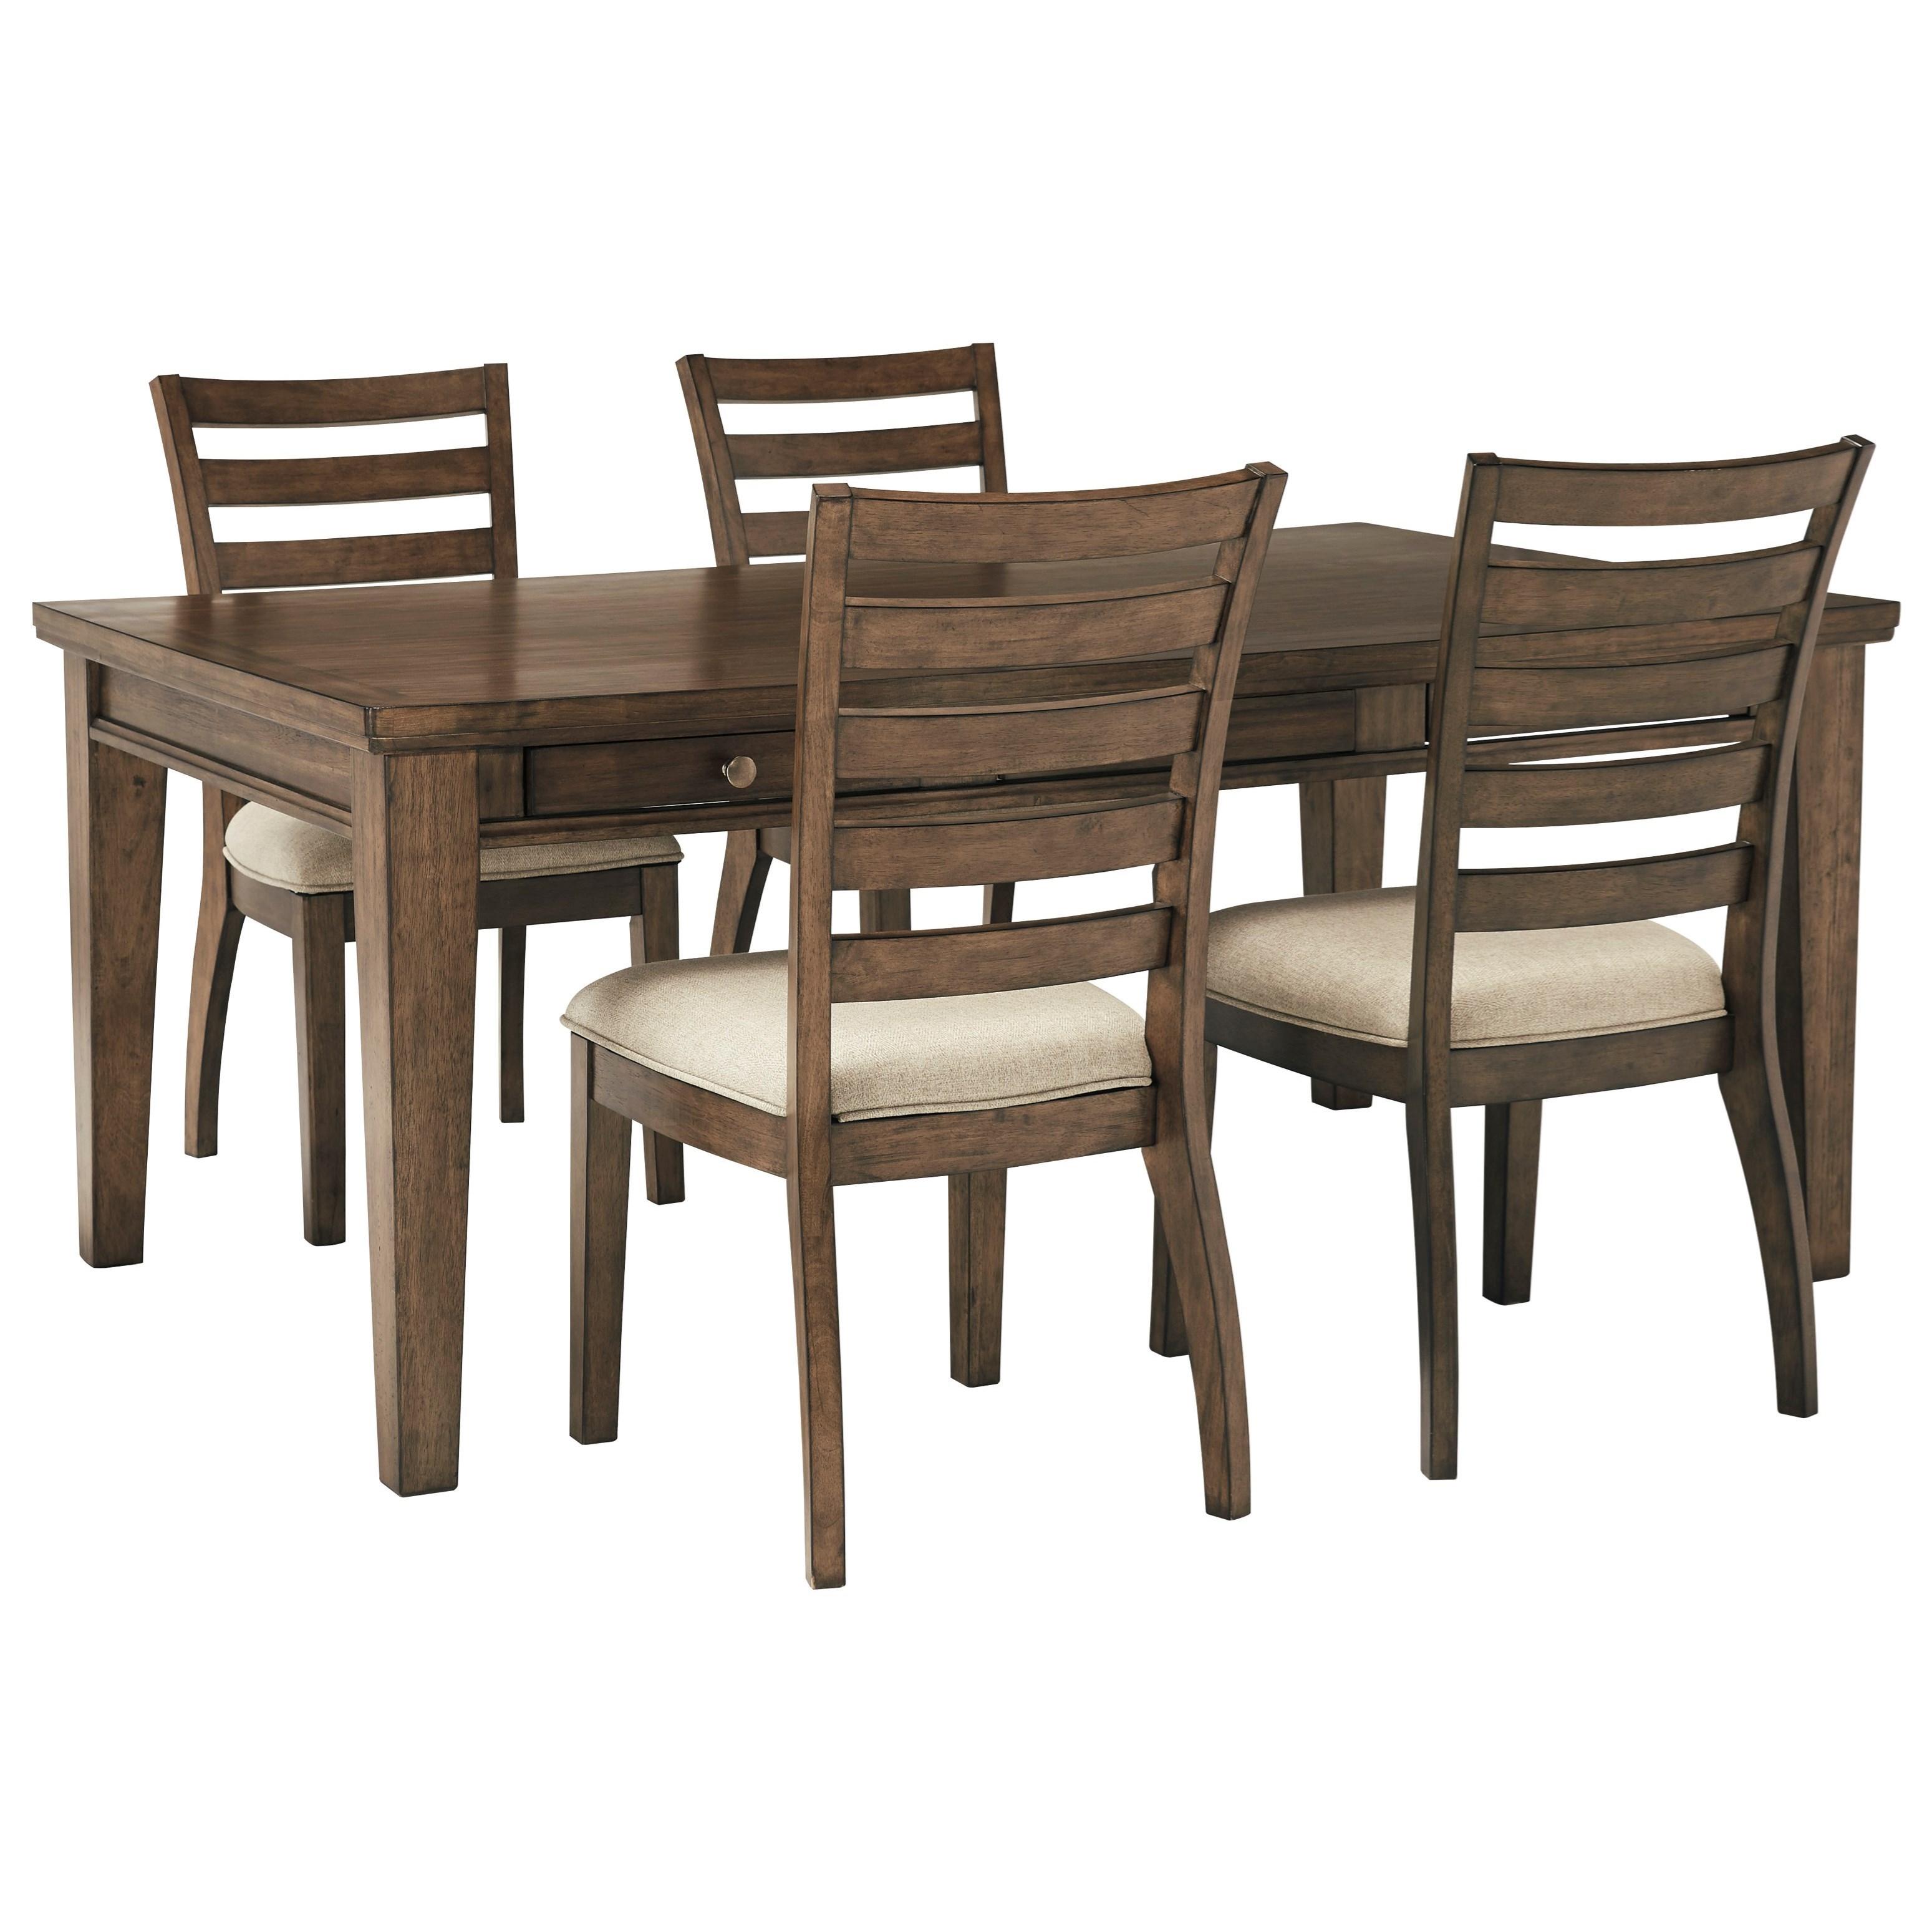 Ashley Furniture Hyland 5 Piece Dining Set With: Signature Design By Ashley Flynnter 5 Piece Storage Table